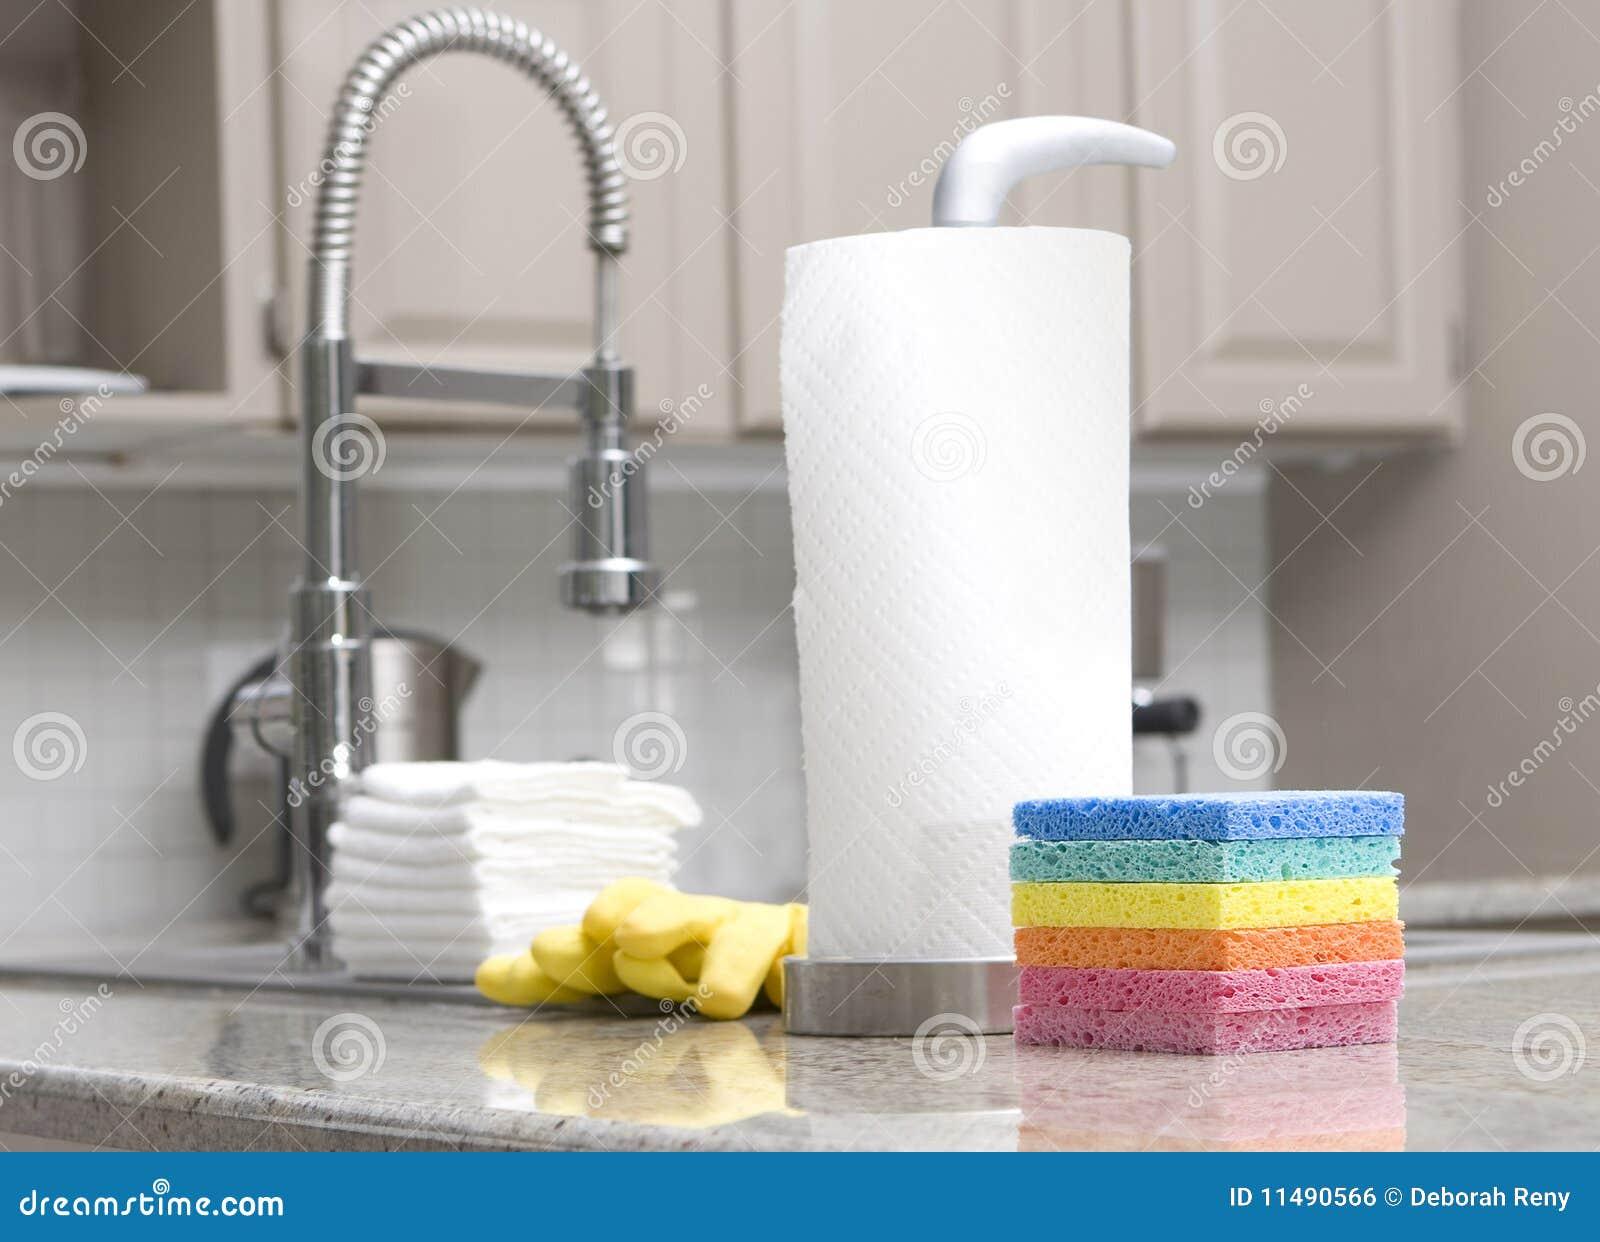 Sponge, paper towels - housework